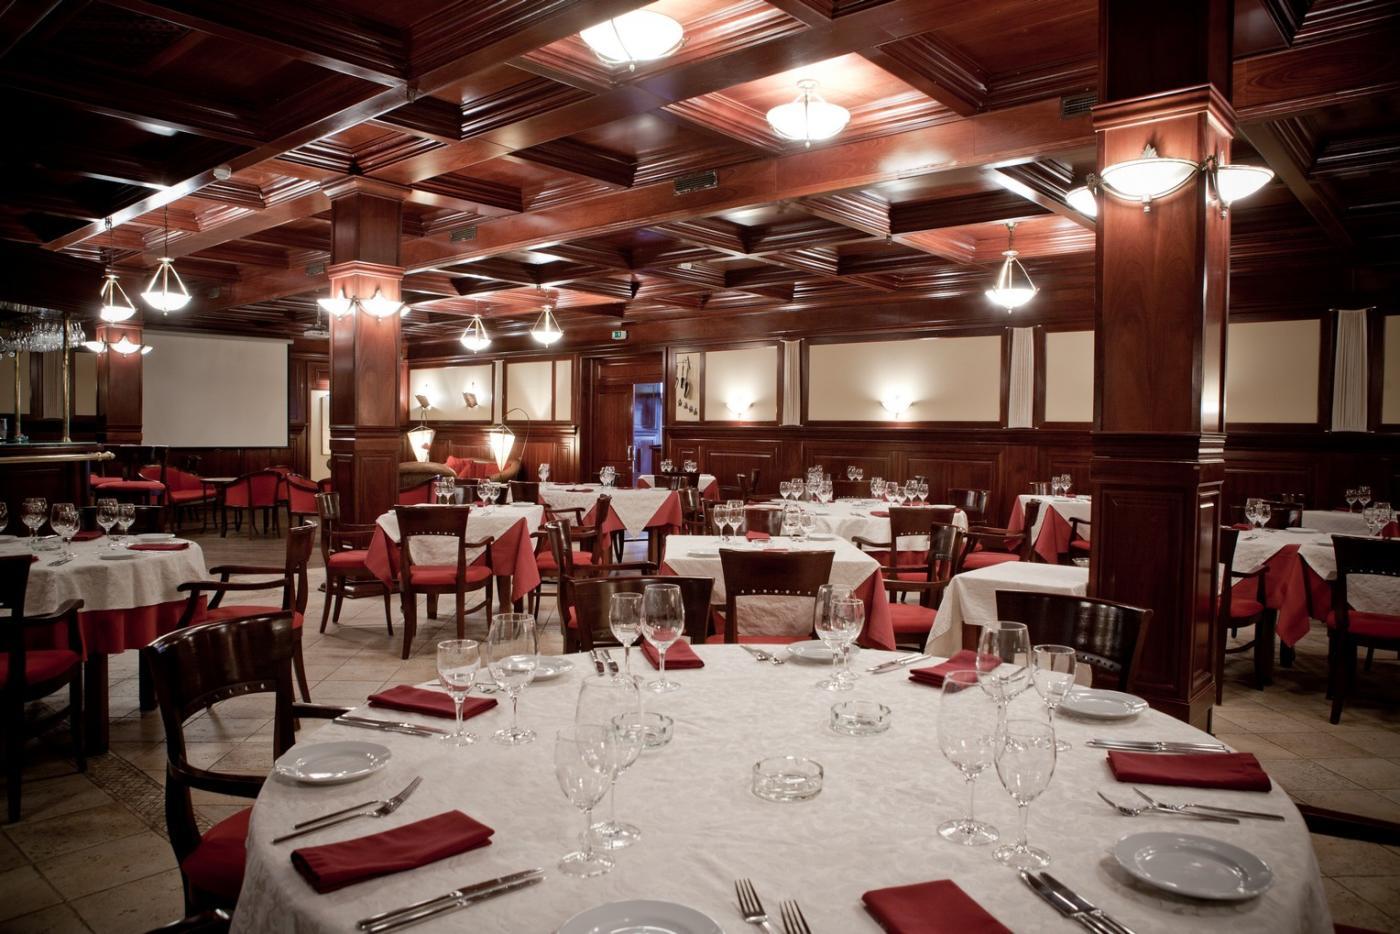 Итальянский Ресторан Чикко Клуб на Азовской (Cicco club) фото